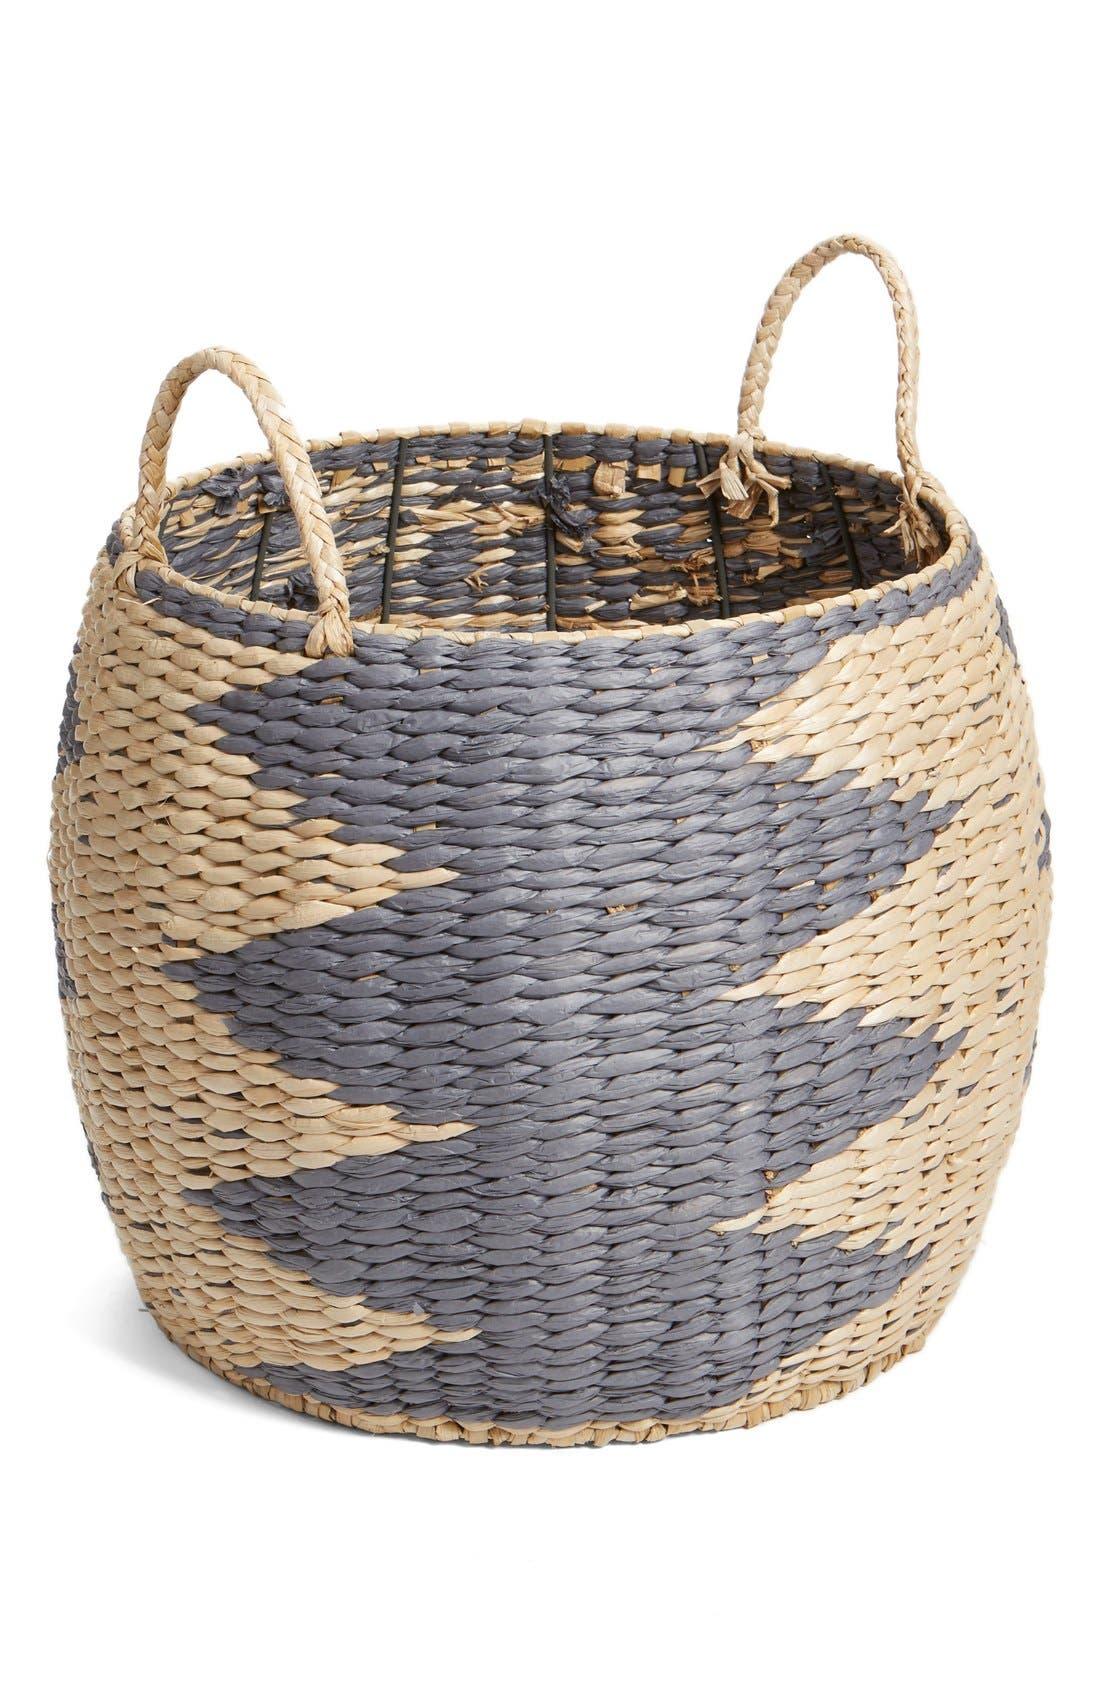 Alternate Image 1 Selected - Levtex Chevron Woven Basket